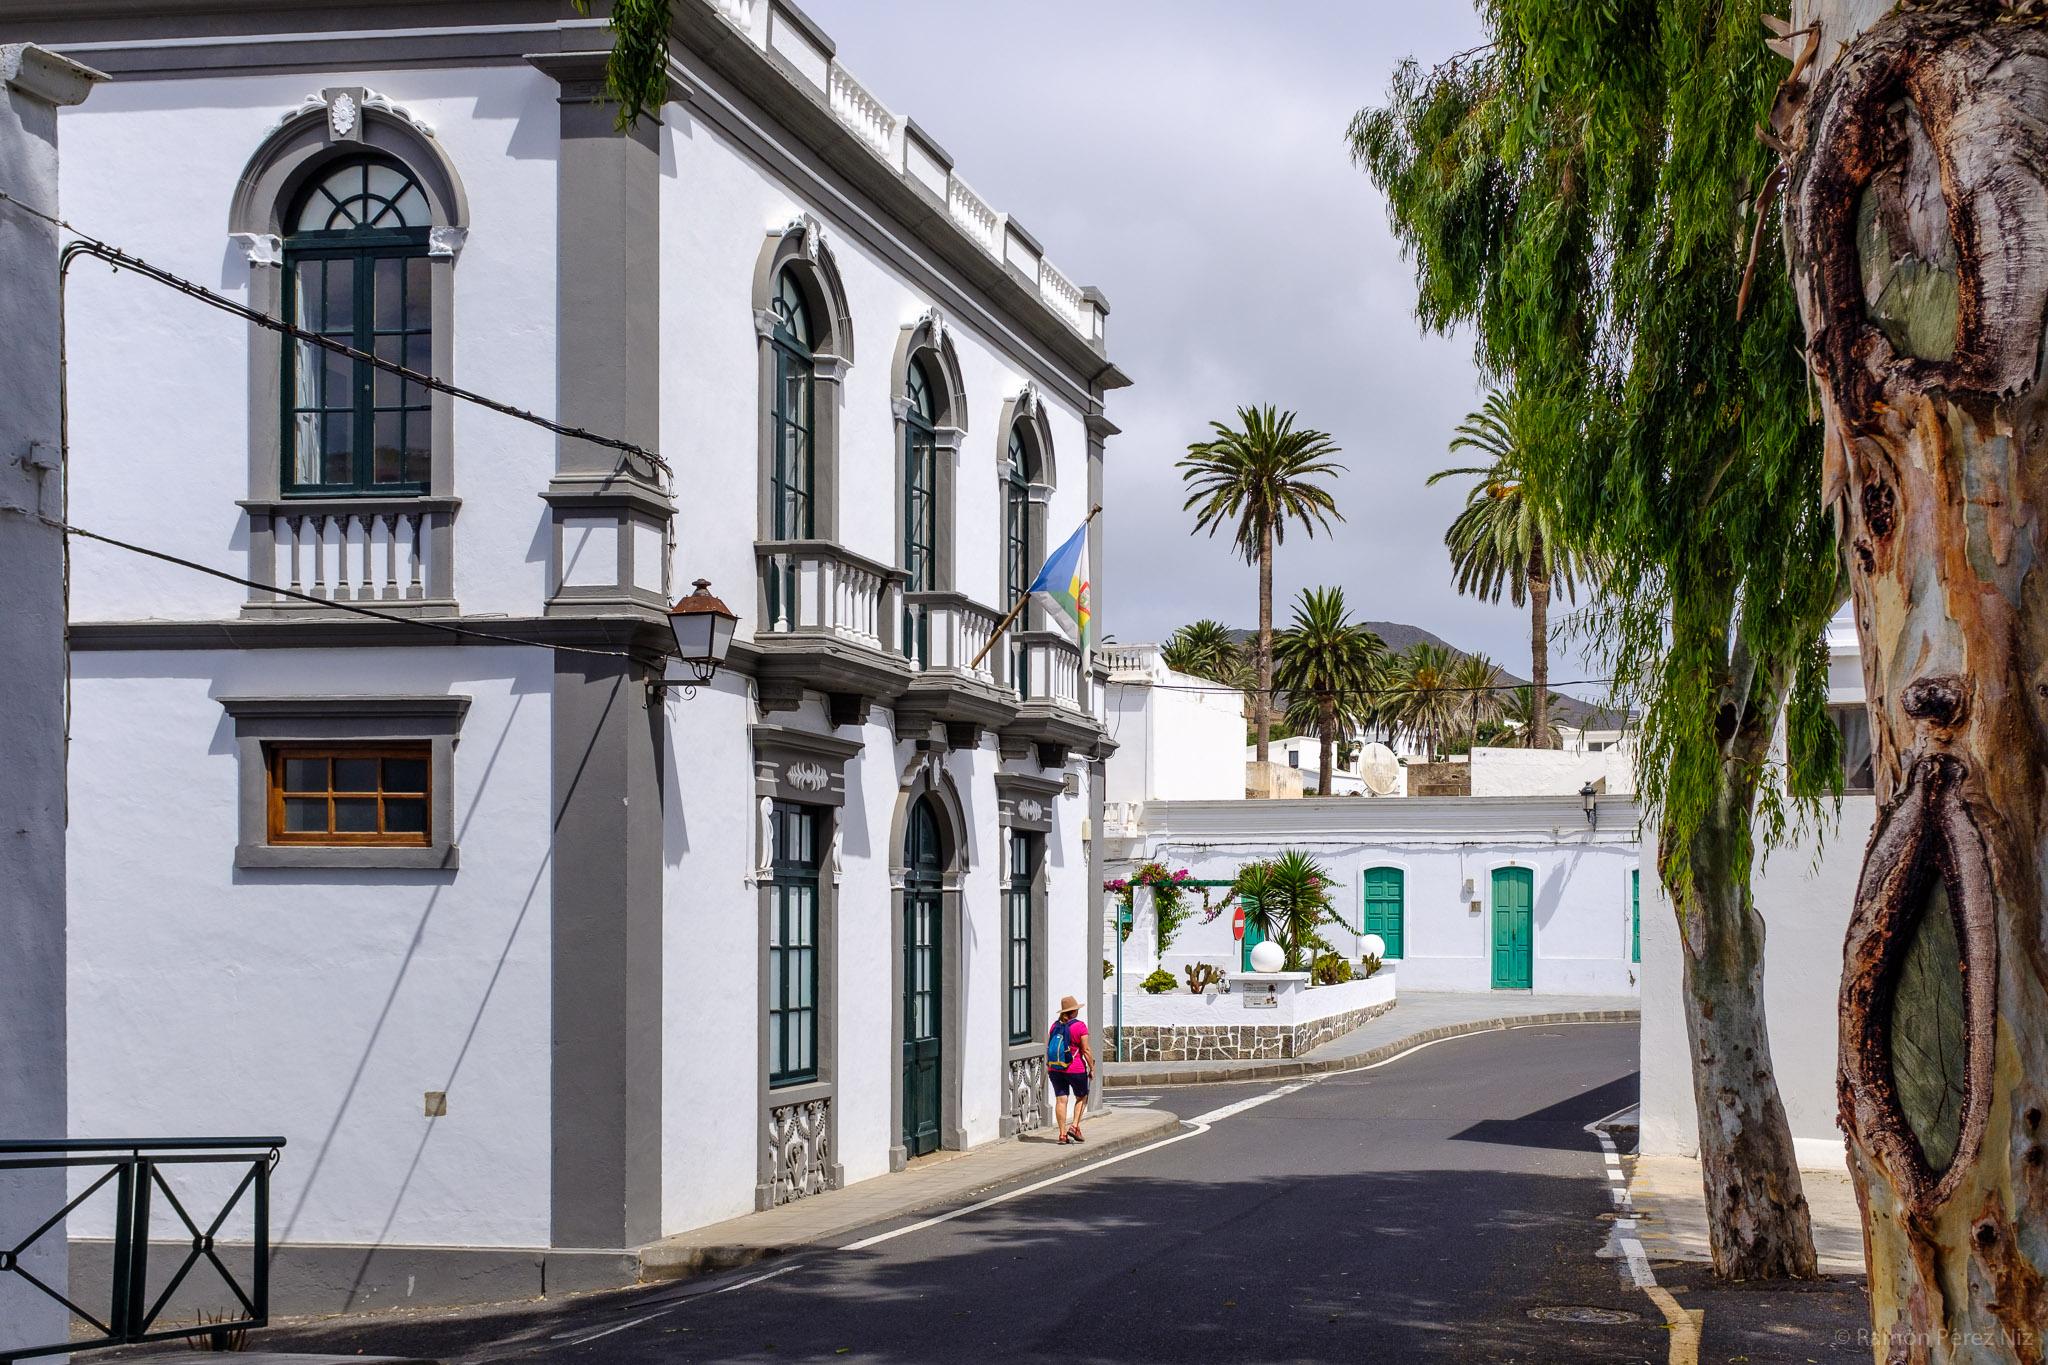 Foto de Ramón Pérez Niz en Haría